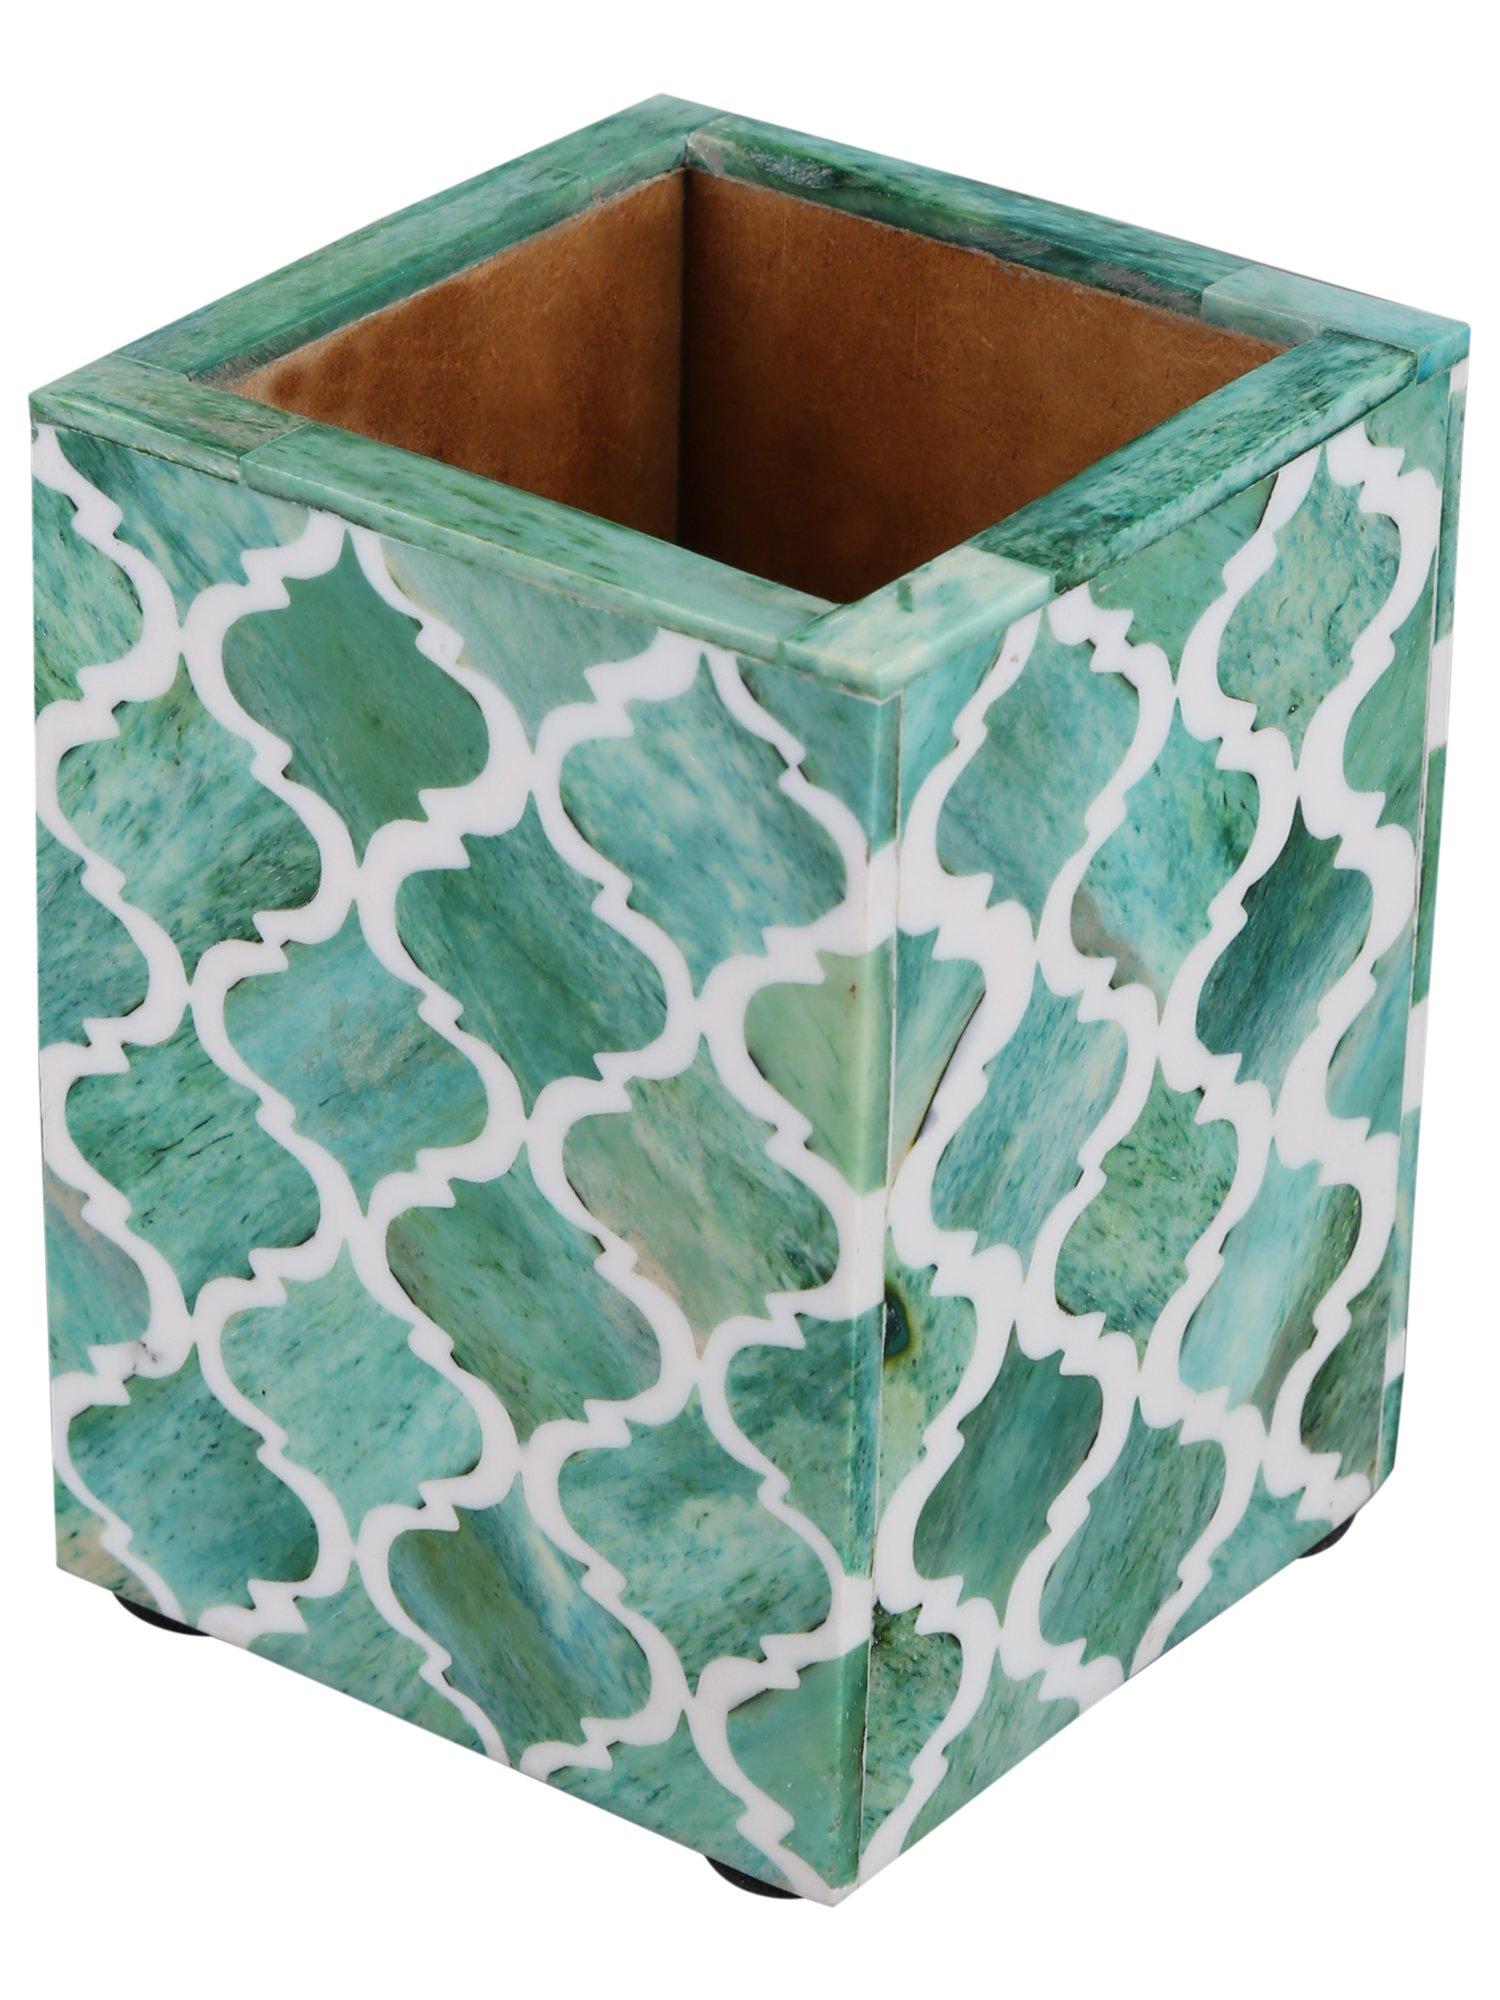 Moroccan & Moorish Art Inspired Desktop Pen & Pencil Holder Cups Office Supplies Organizer Caddy from Handicrafts Home (4x3x4 inches, Green)